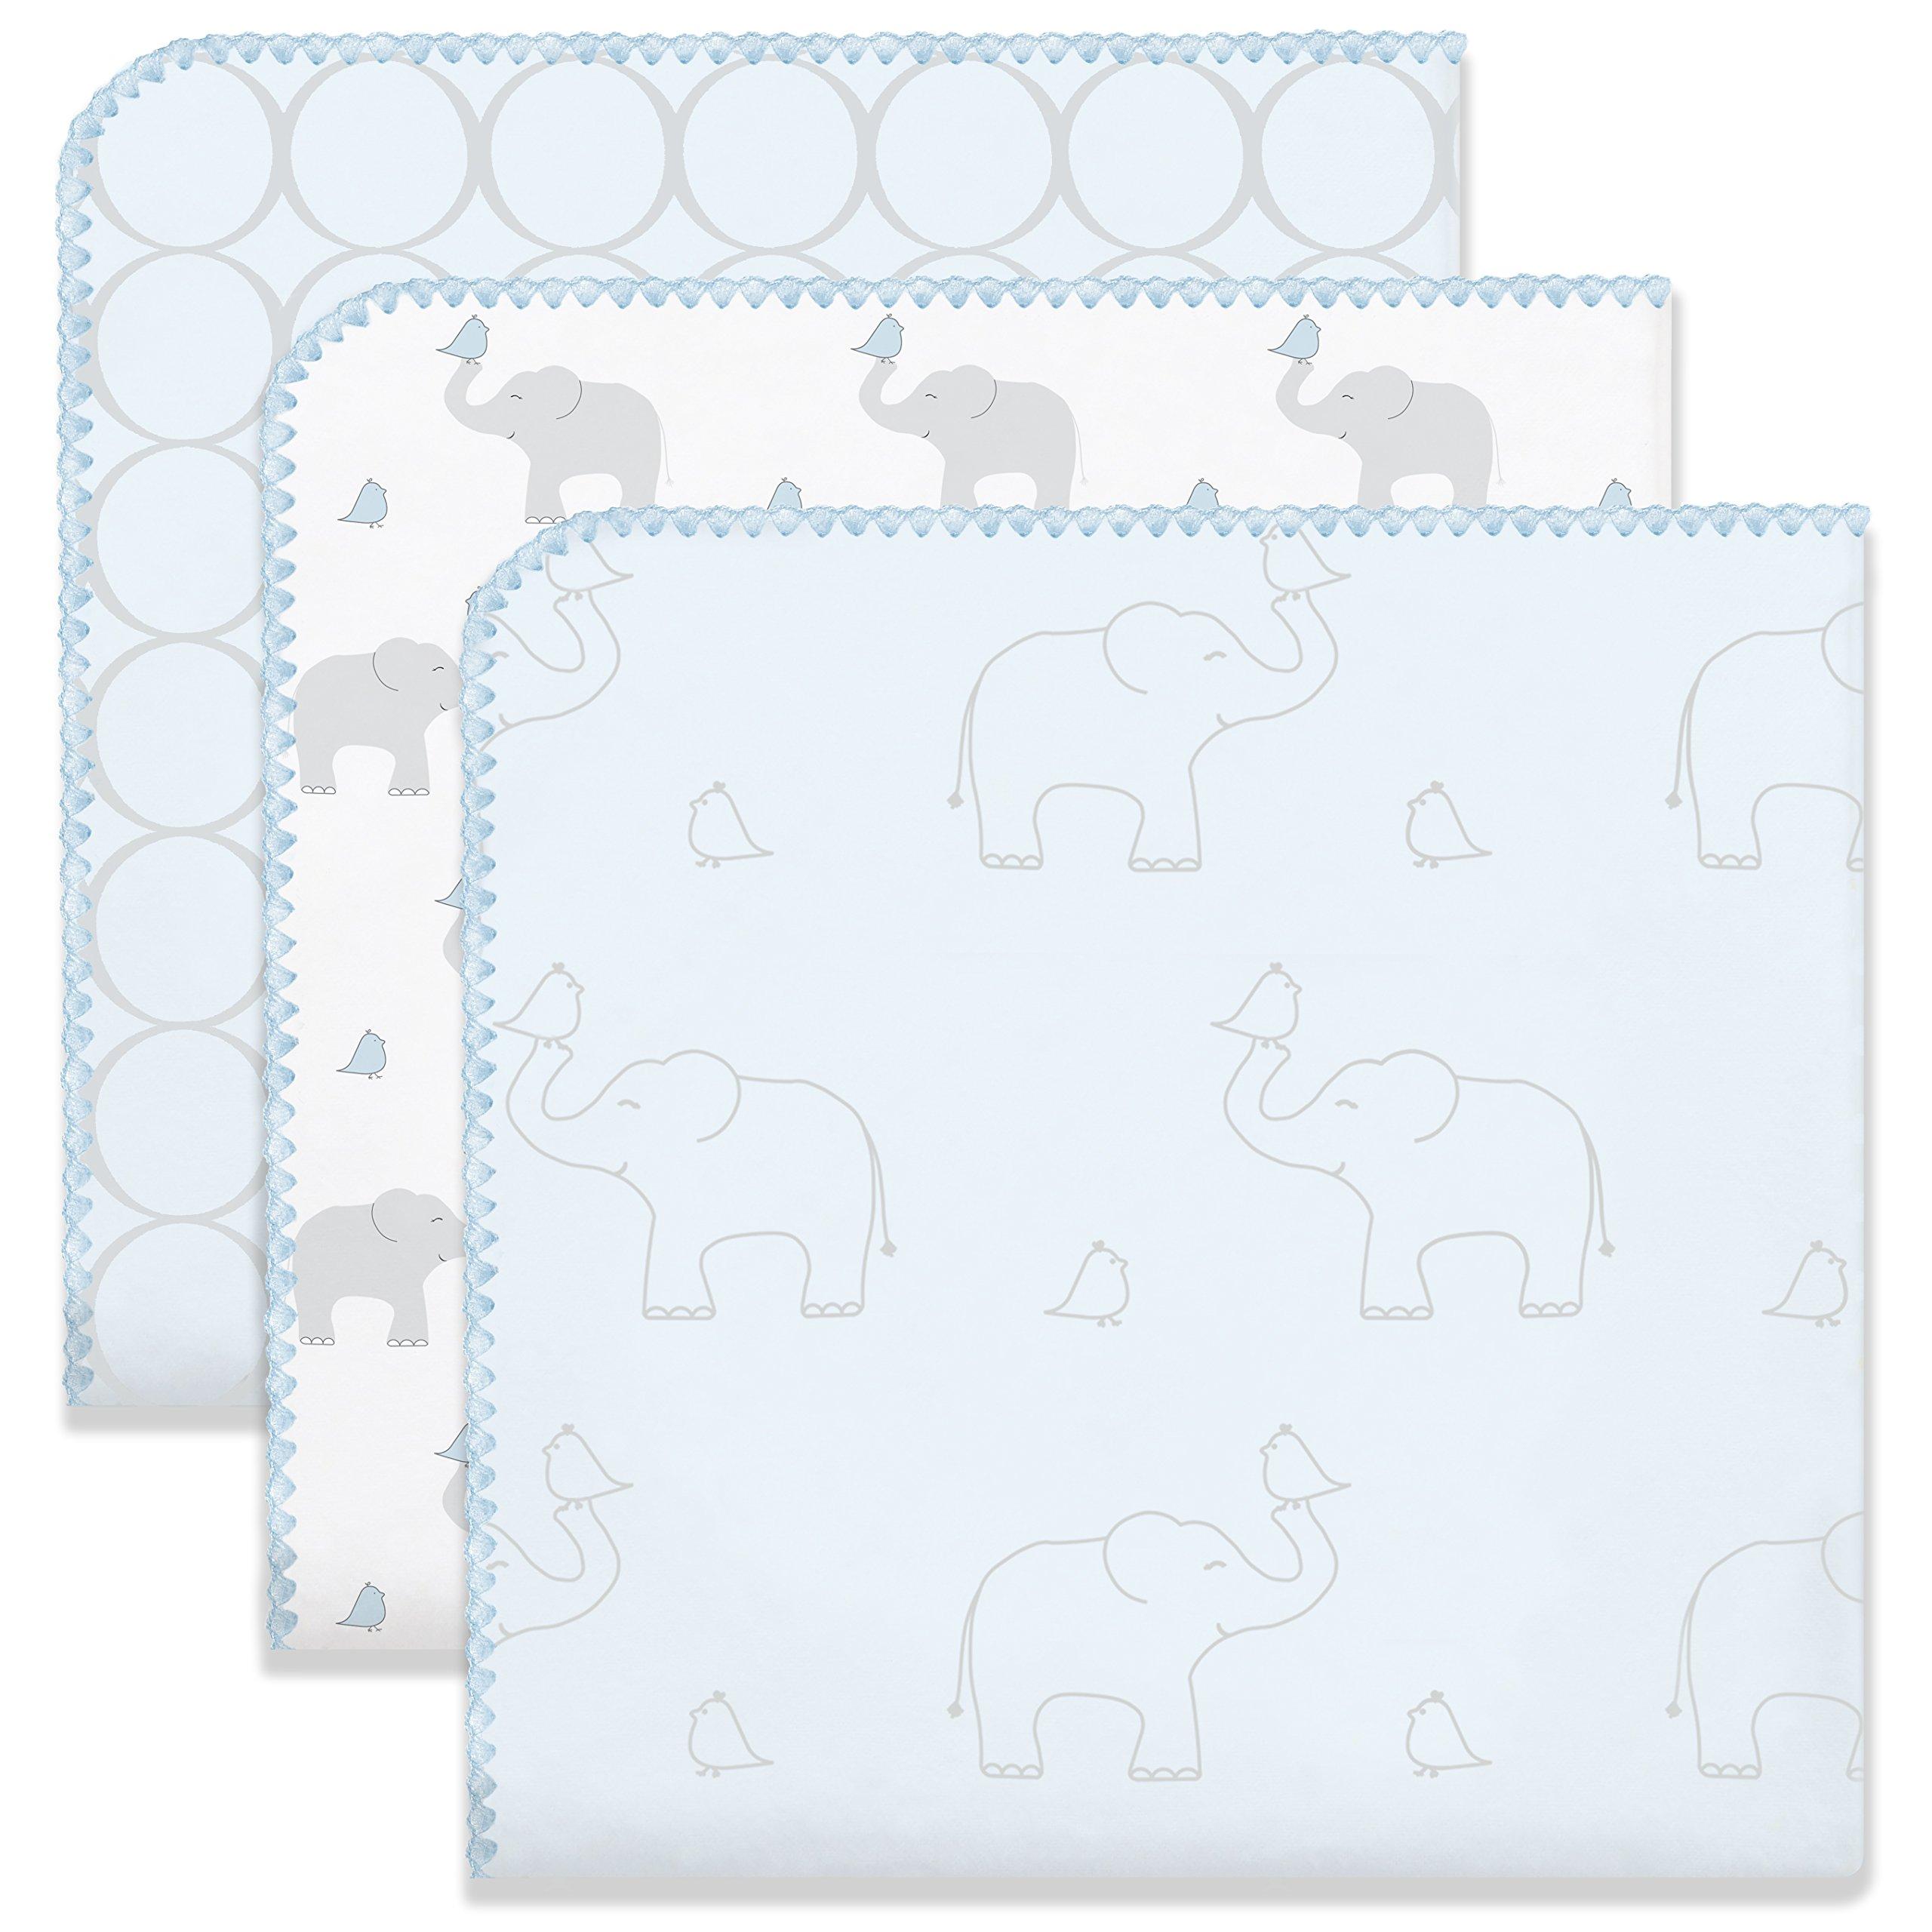 SwaddleDesigns Ultimate Swaddle Blankets, Set of 3, Mod Circles and Elephants, Sunwashed Blue (Mom's Choice Award Winner)